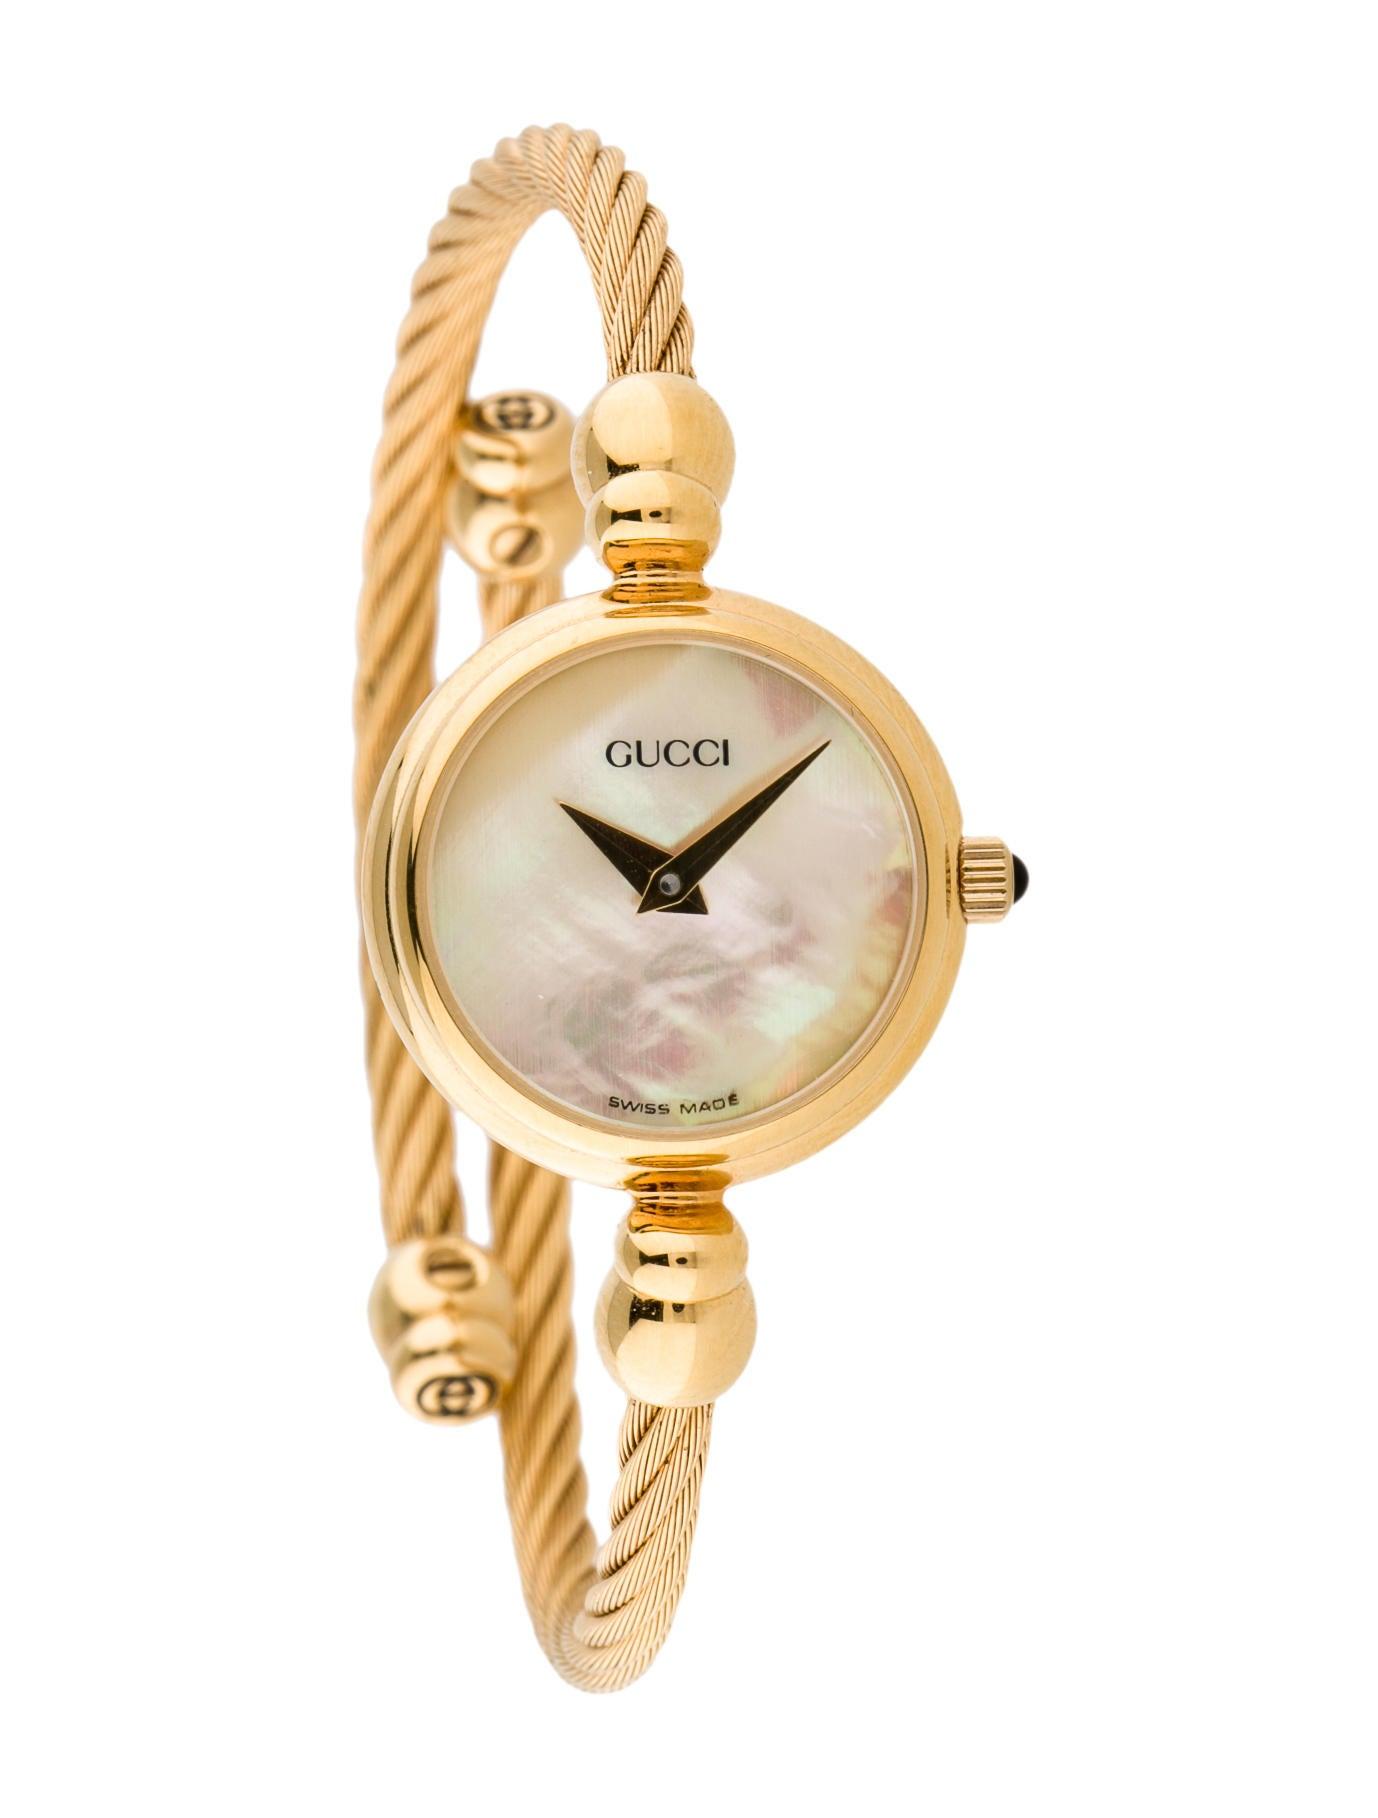 afe23be5c36 Gucci 2700.2.L Coil Watch - Bracelet - GUC57212